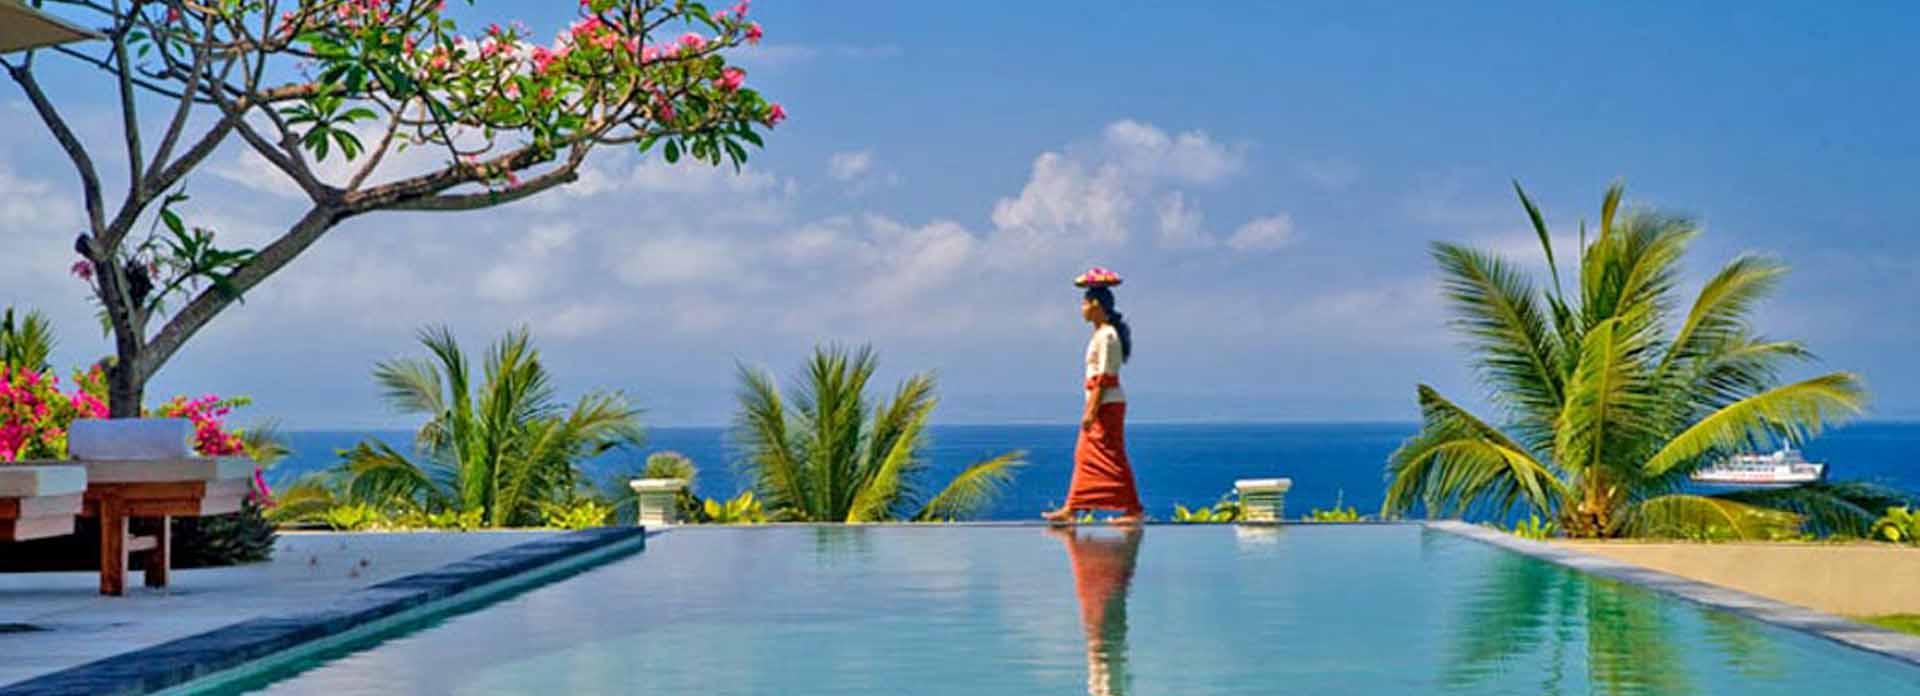 Parikrama Travels Bali Banner 6